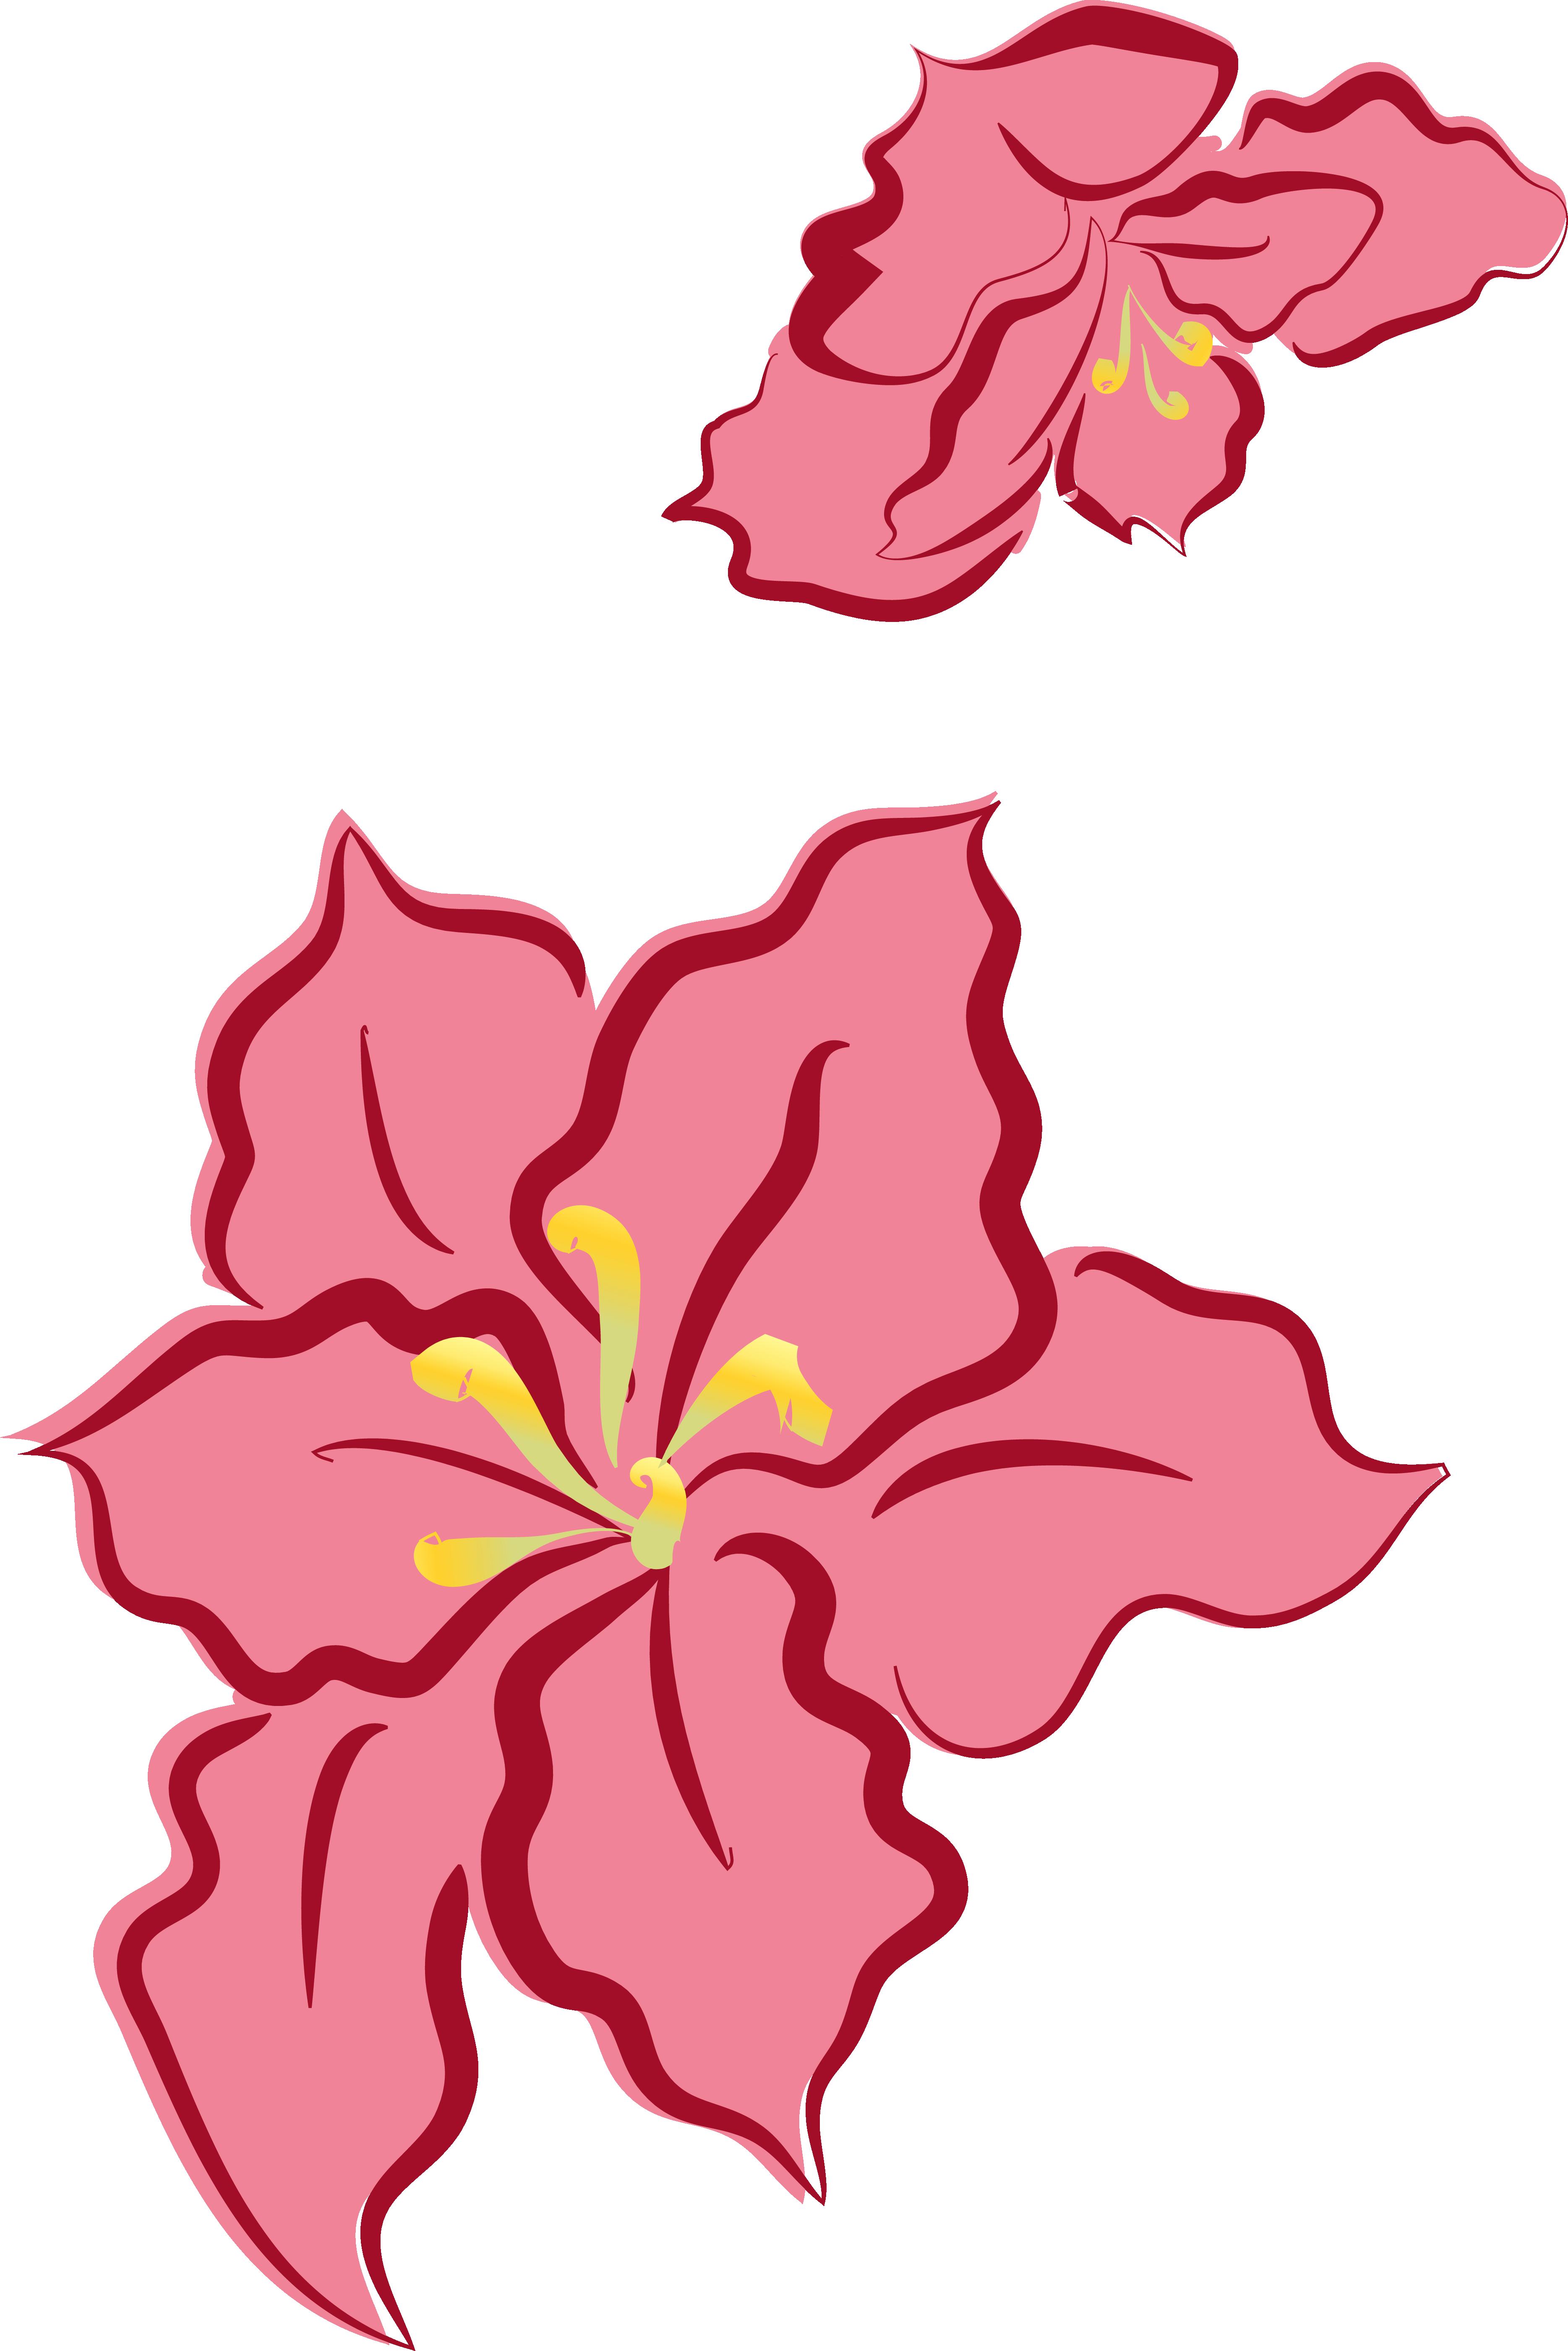 Poinsettias clipart outline. Designed for christmas decoration